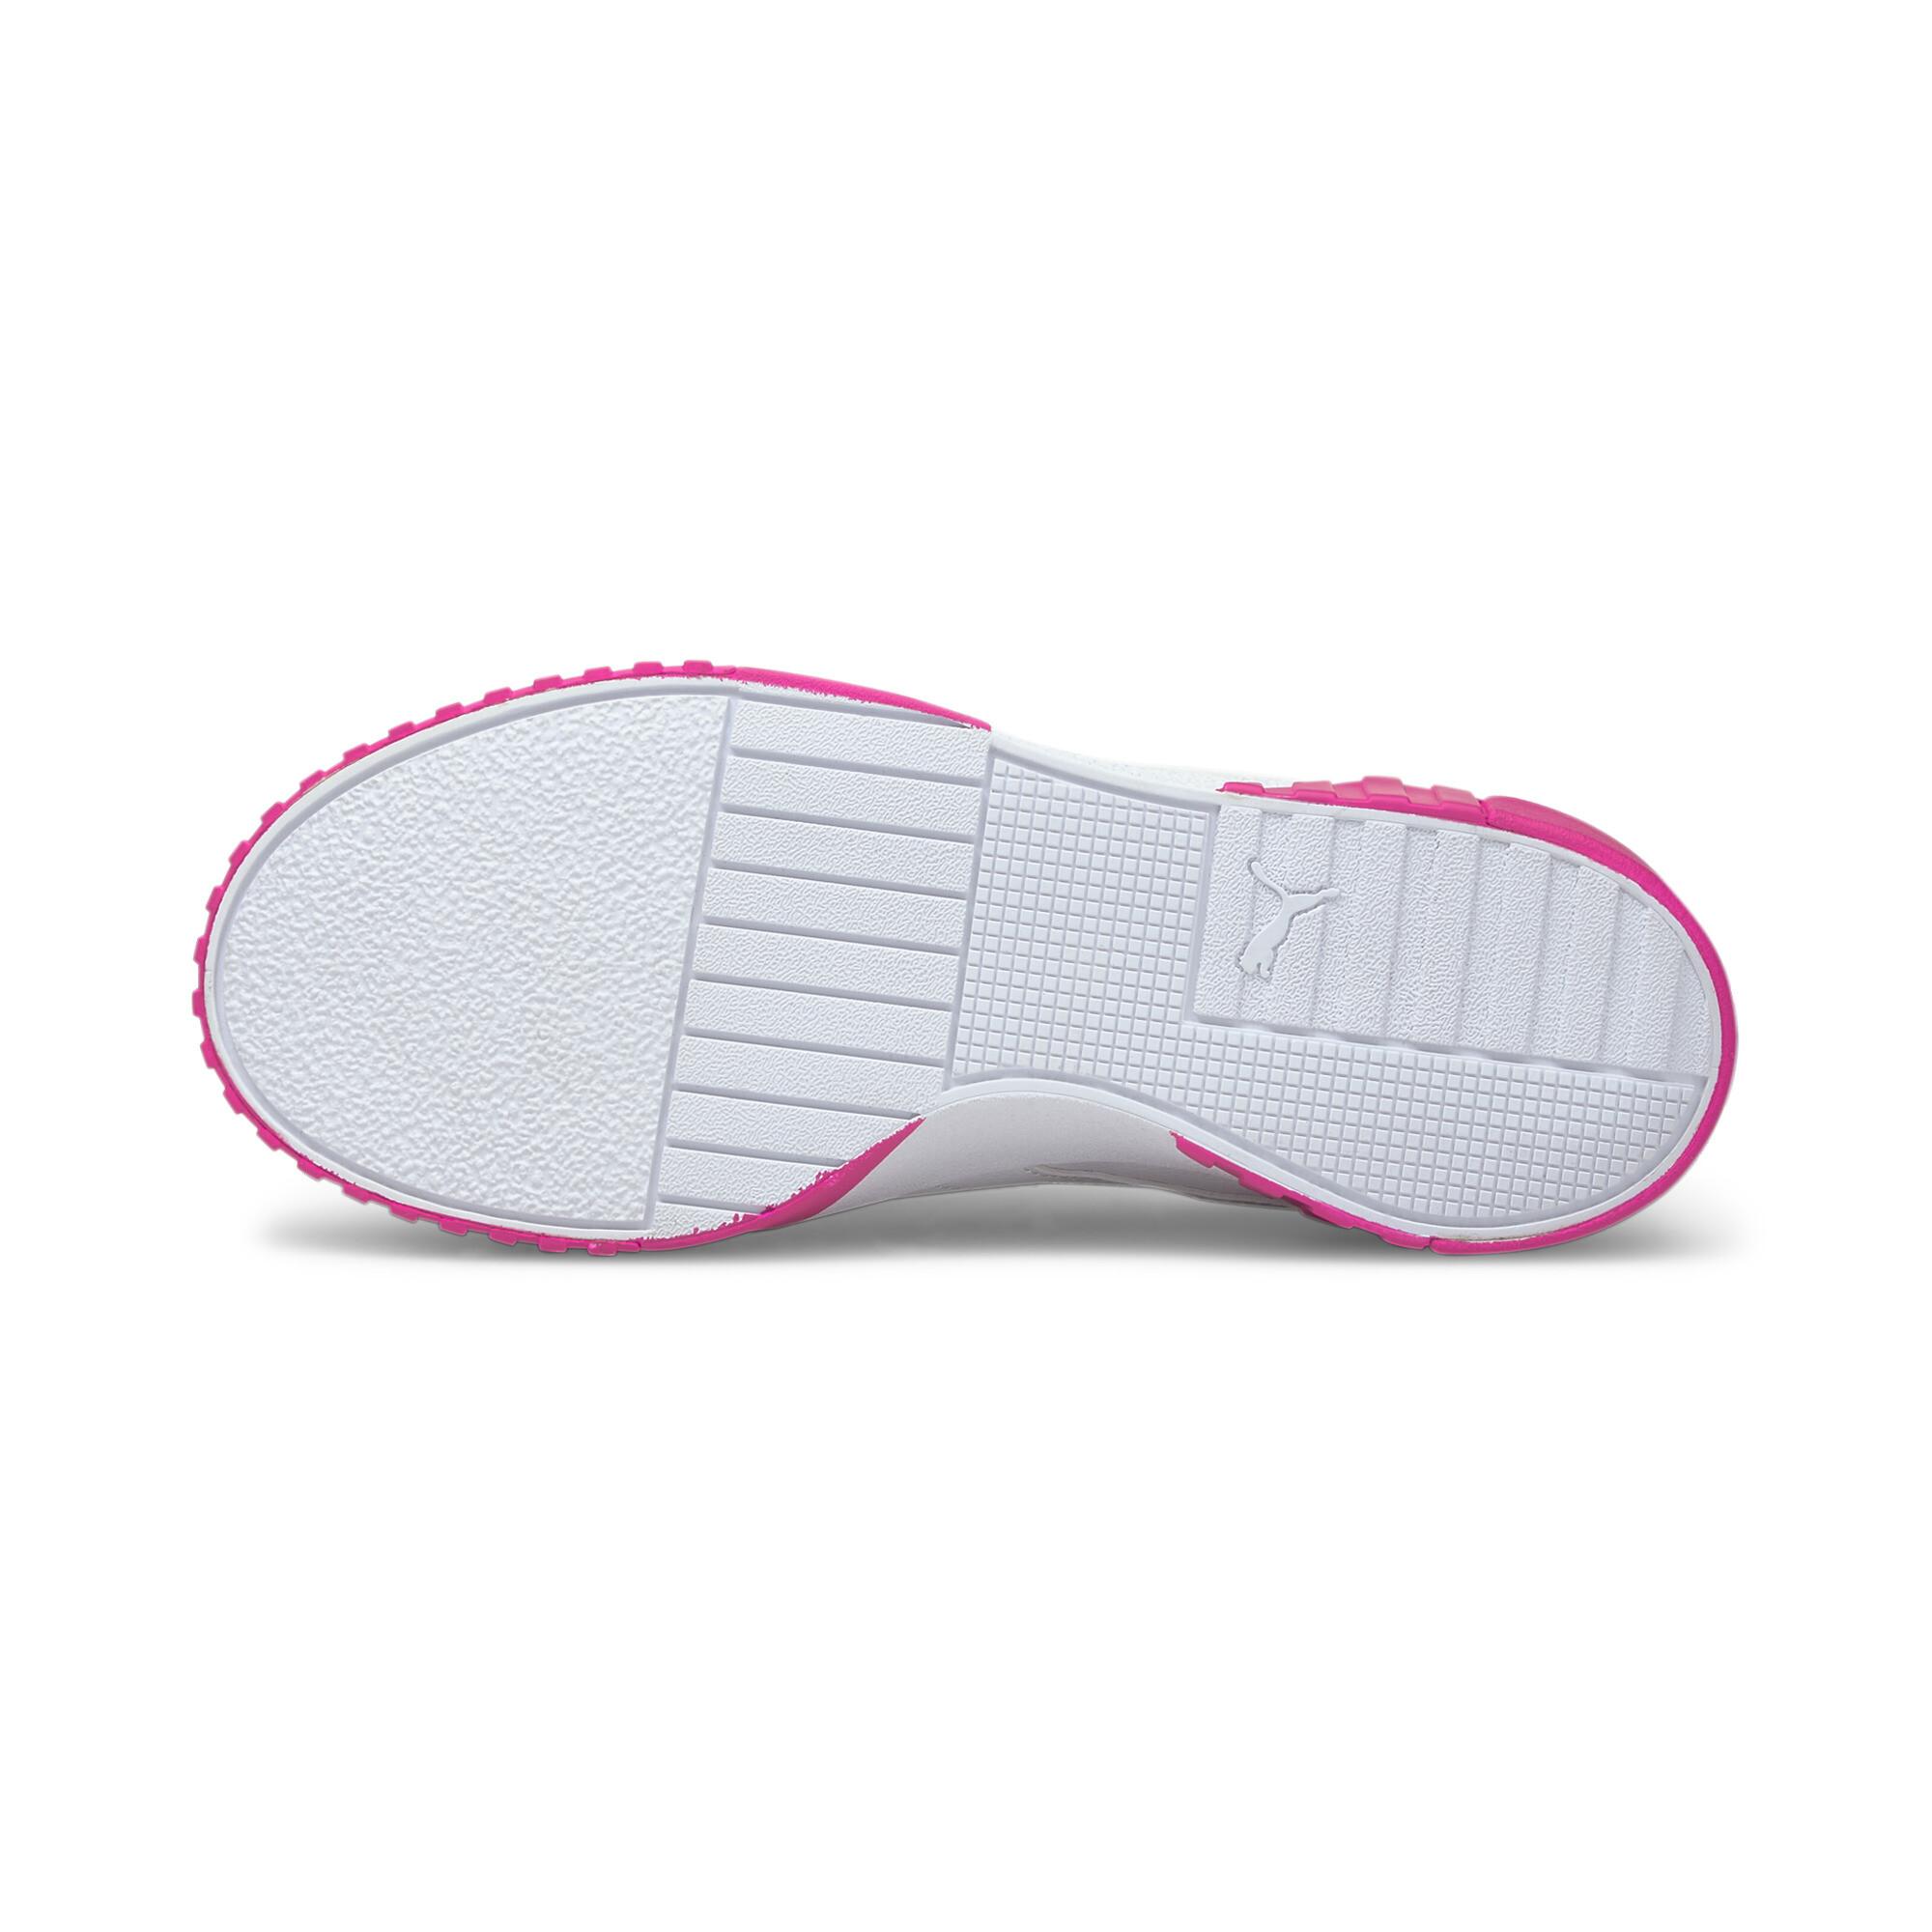 PUMA-Women-039-s-Cali-Sneakers thumbnail 5